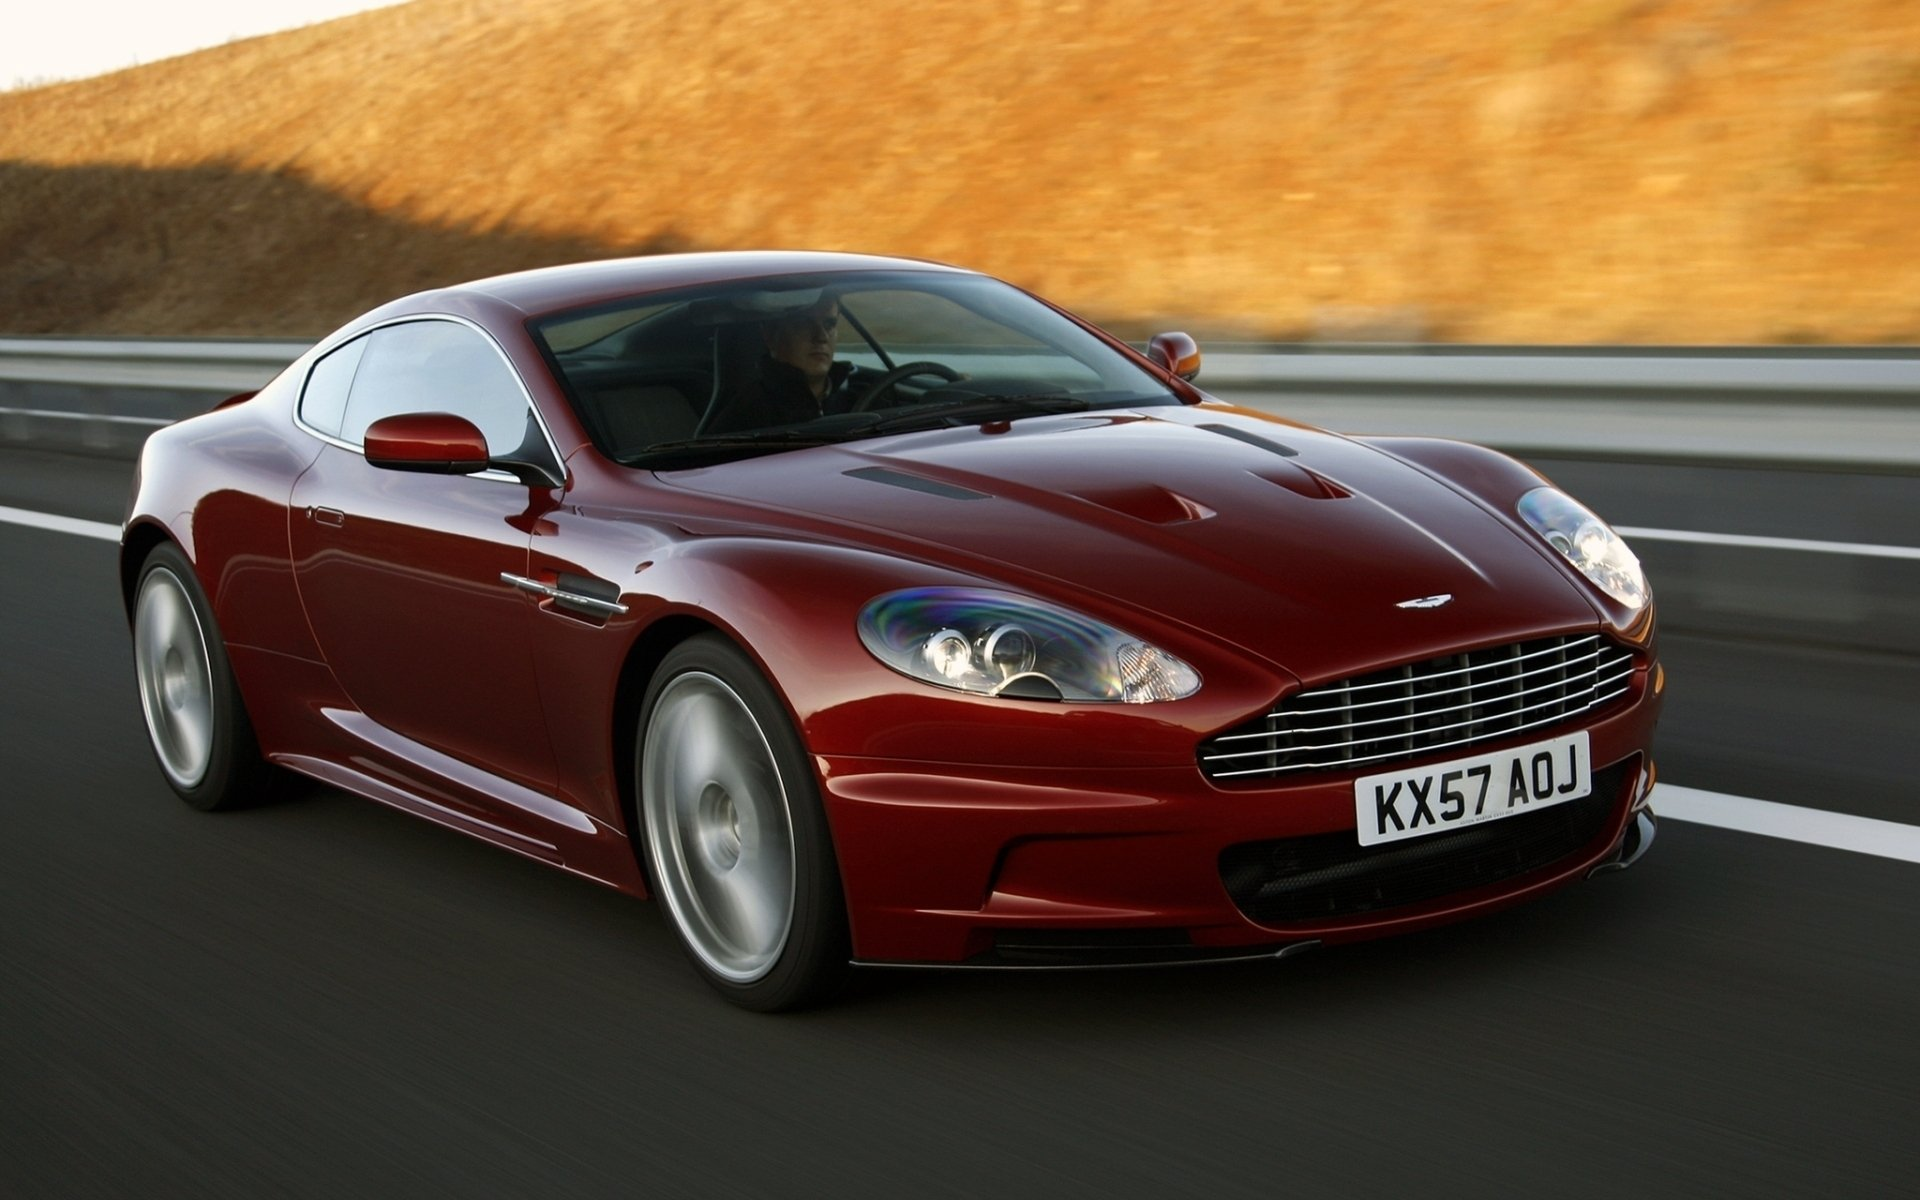 Vehicles - Aston Martin DBS  Wallpaper